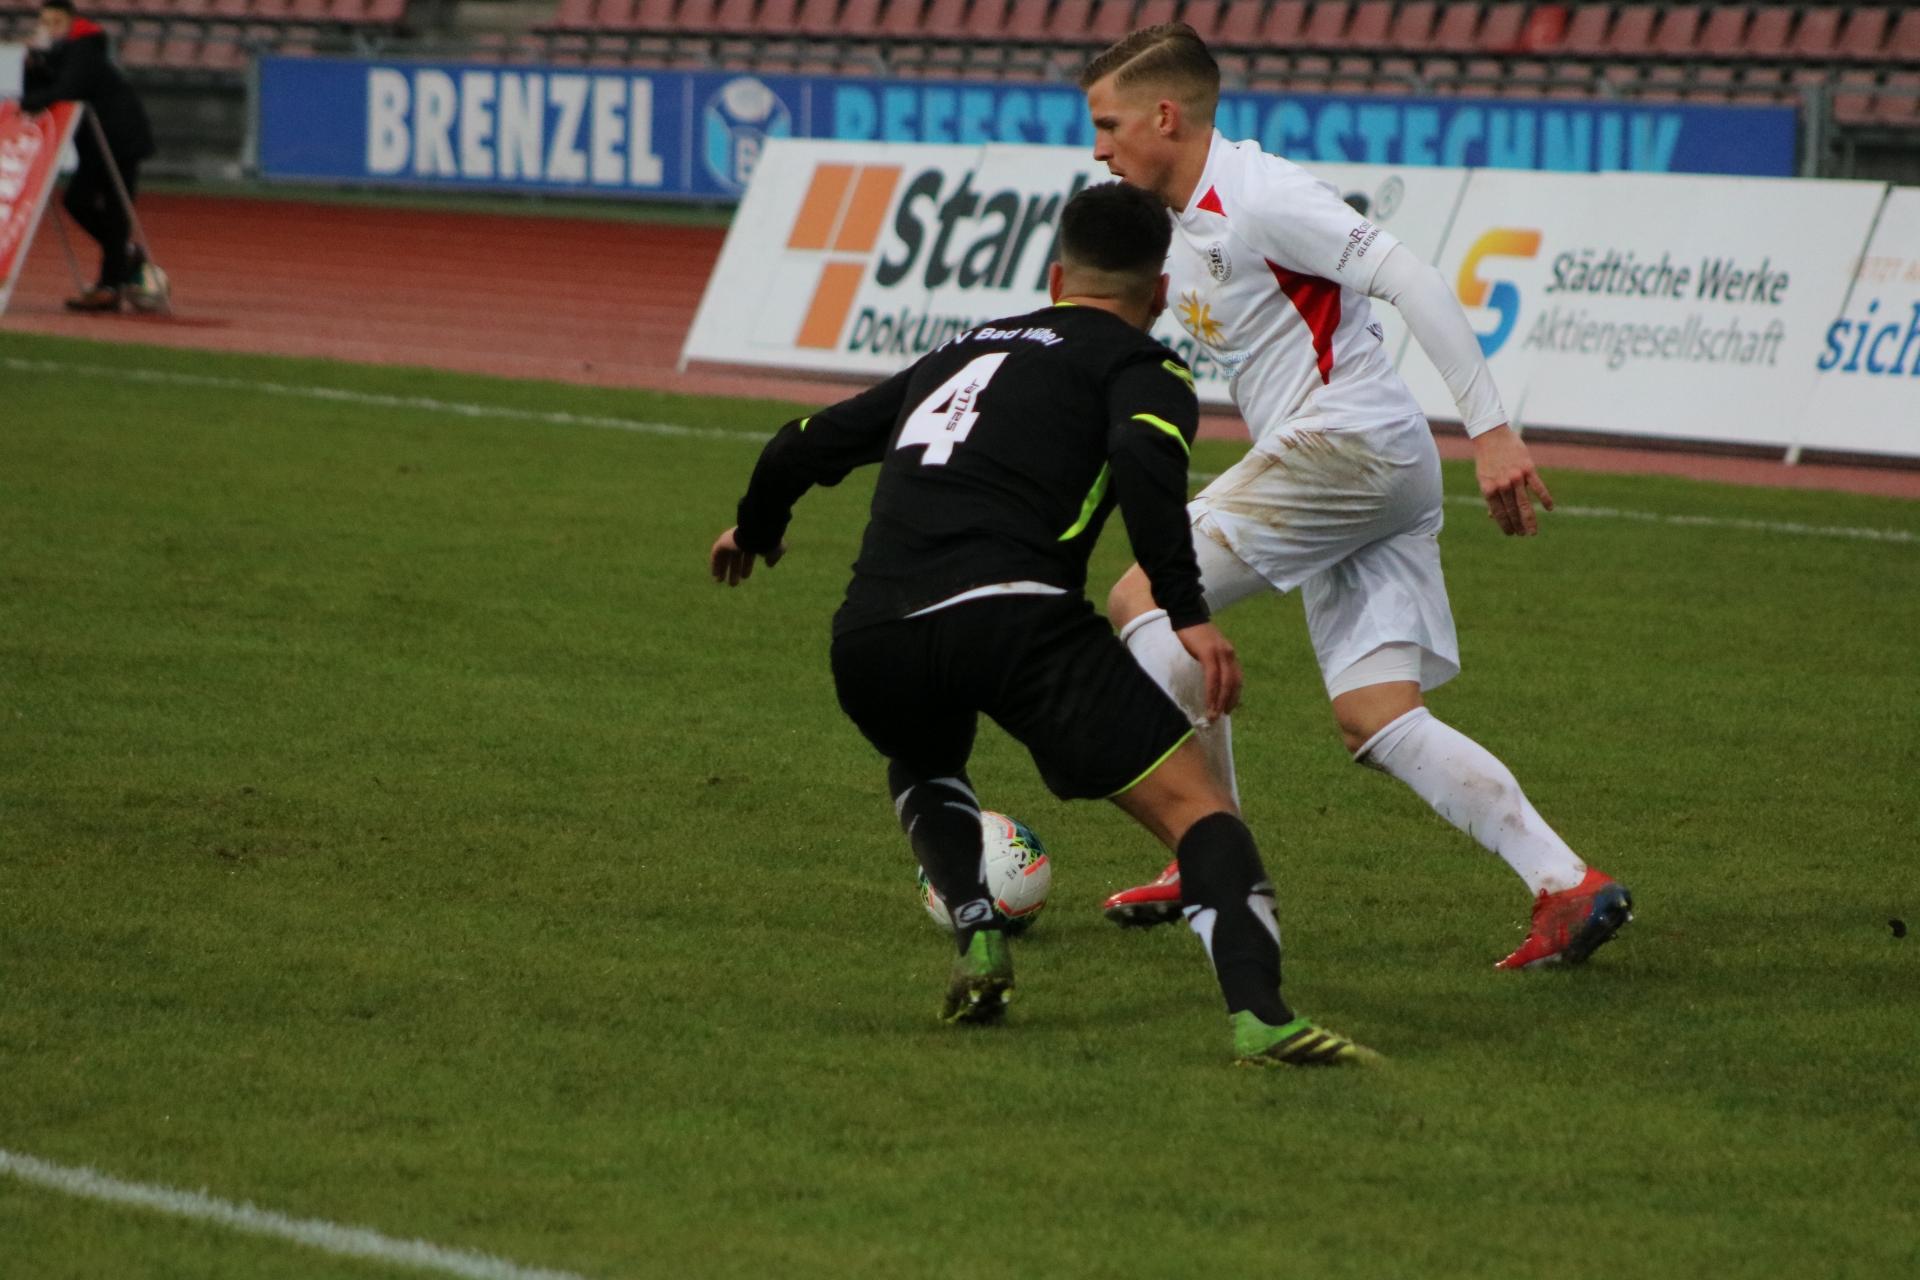 Lotto Hessenliga 2019/2020, KSV Hessen Kassel, FV Bad Vilbel, Endstand 6:1, Tim-Philipp Brandner (KSV Hessen Kassel)